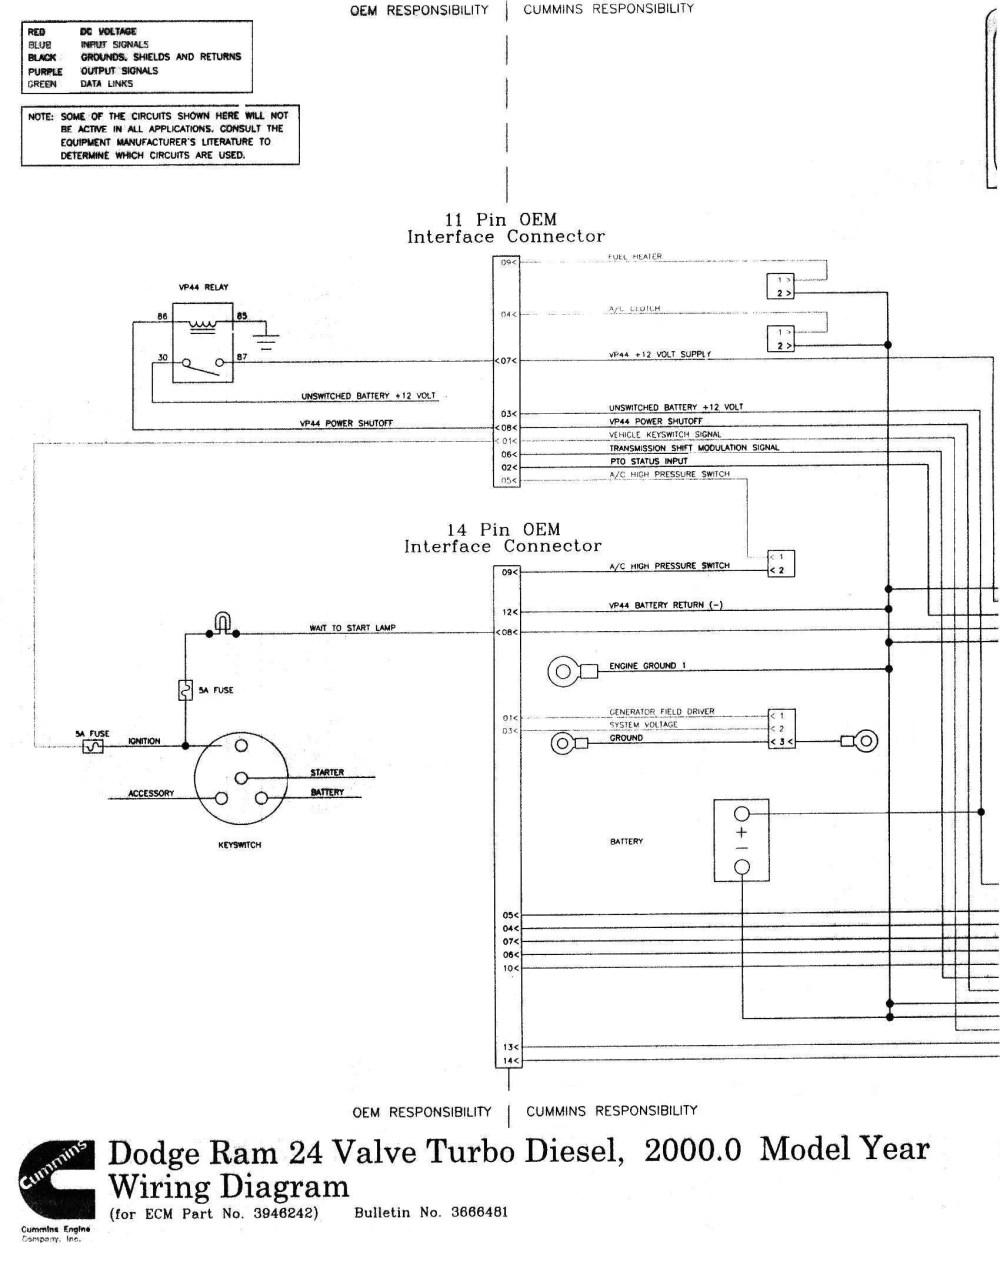 medium resolution of 2005 dodge cummins ecm wiring diagram 2006 dodge ram 1500 trailer wiring diagram new wiring